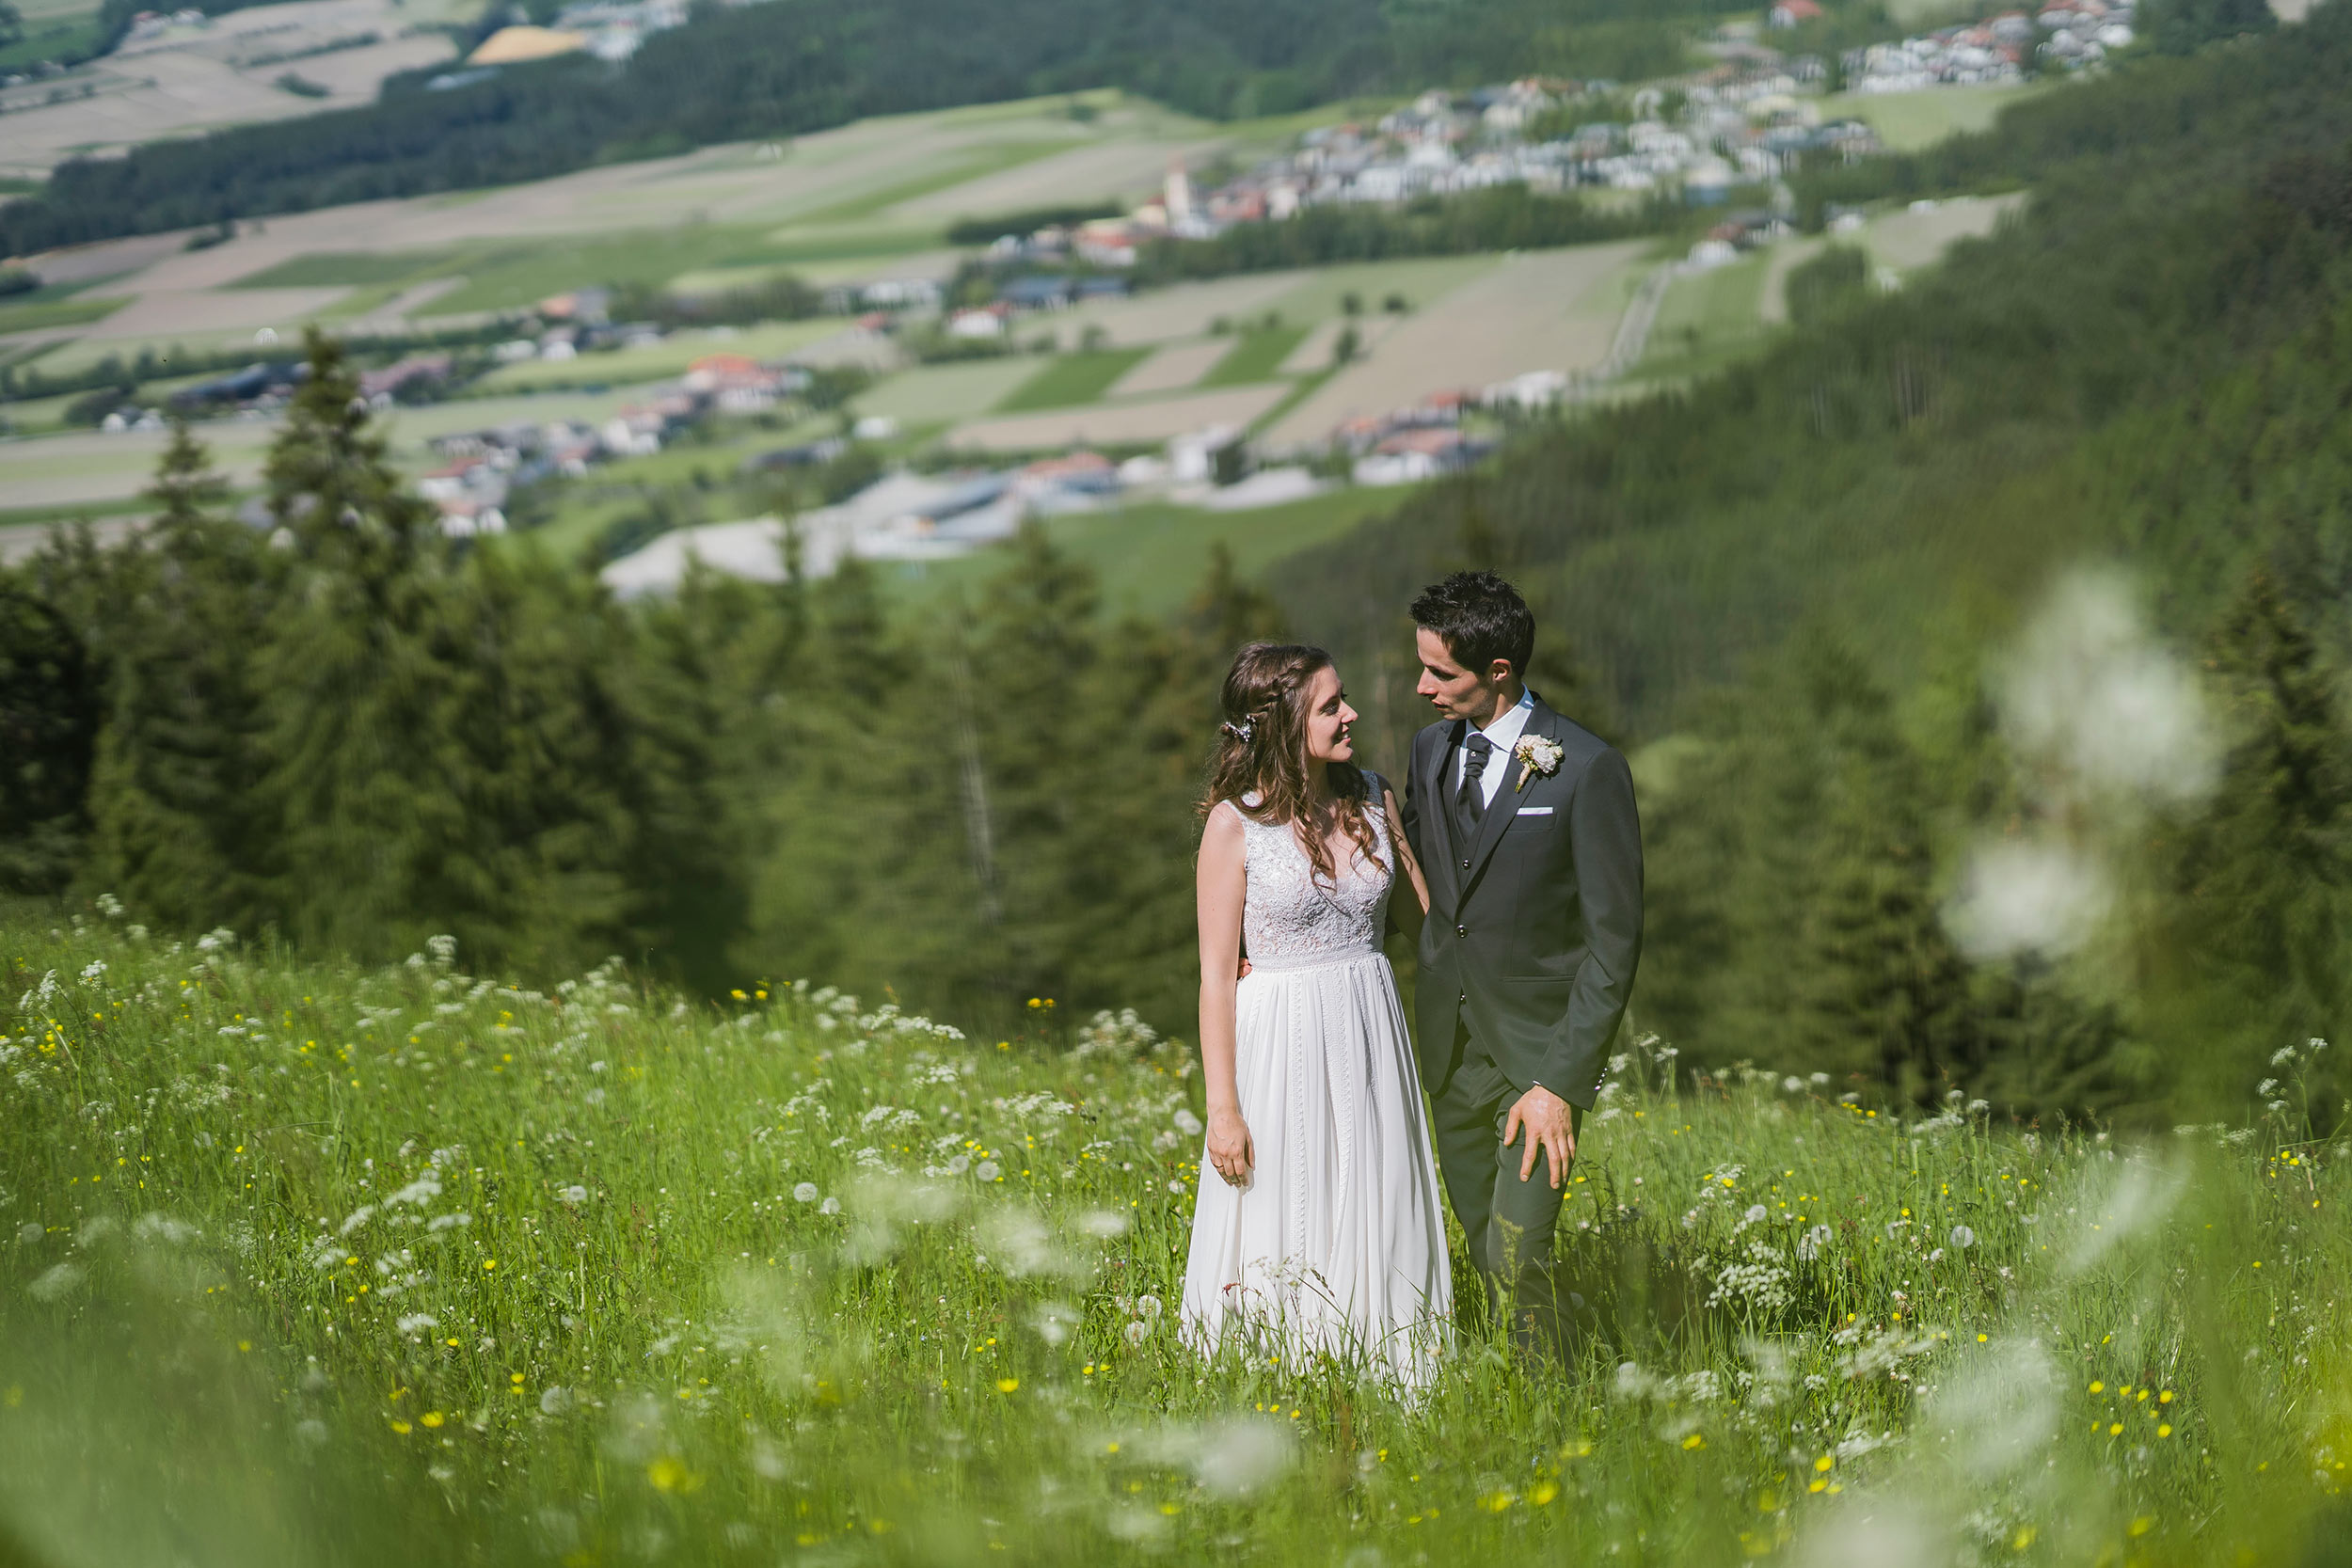 Evi_&_Christian_Hochzeit_01-06-2019_386